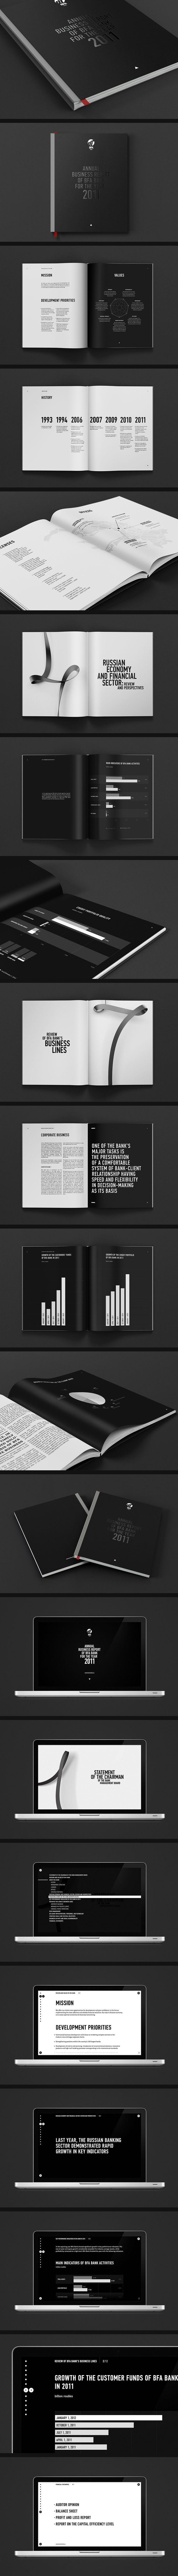 best portfolio resume images on pinterest editorial design